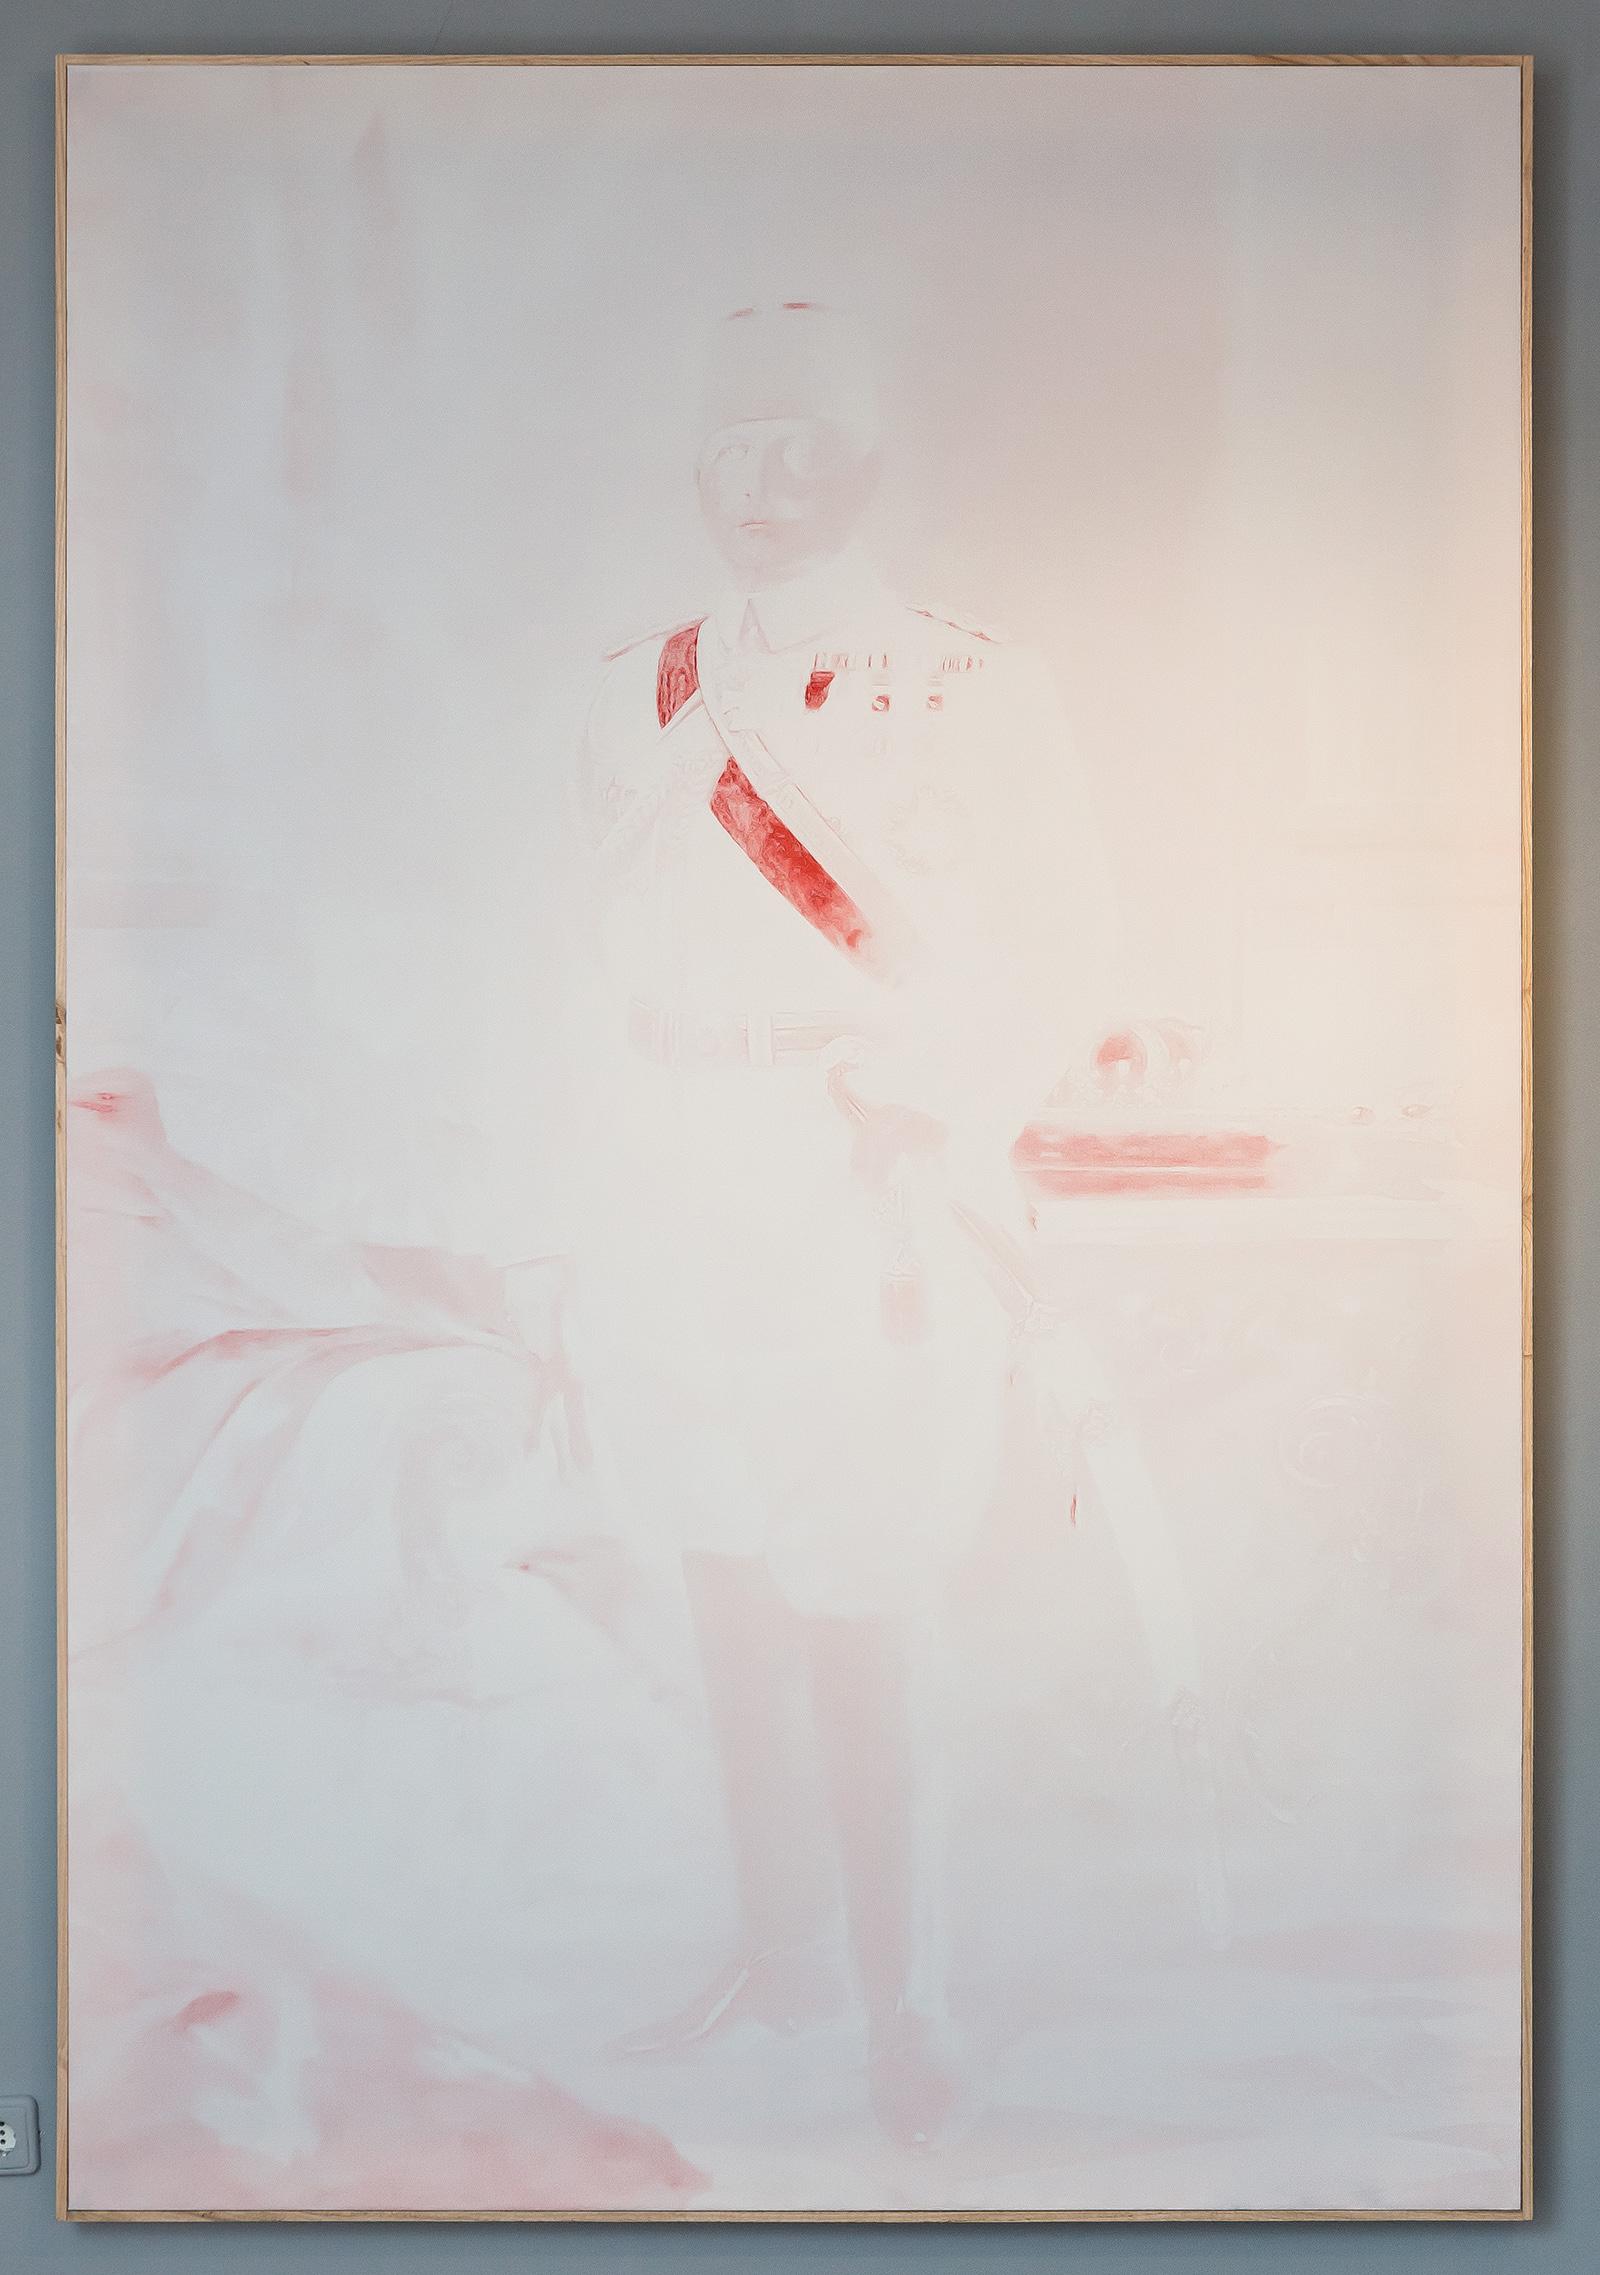 Viron Erol Vert, The Crossdresser, 2014